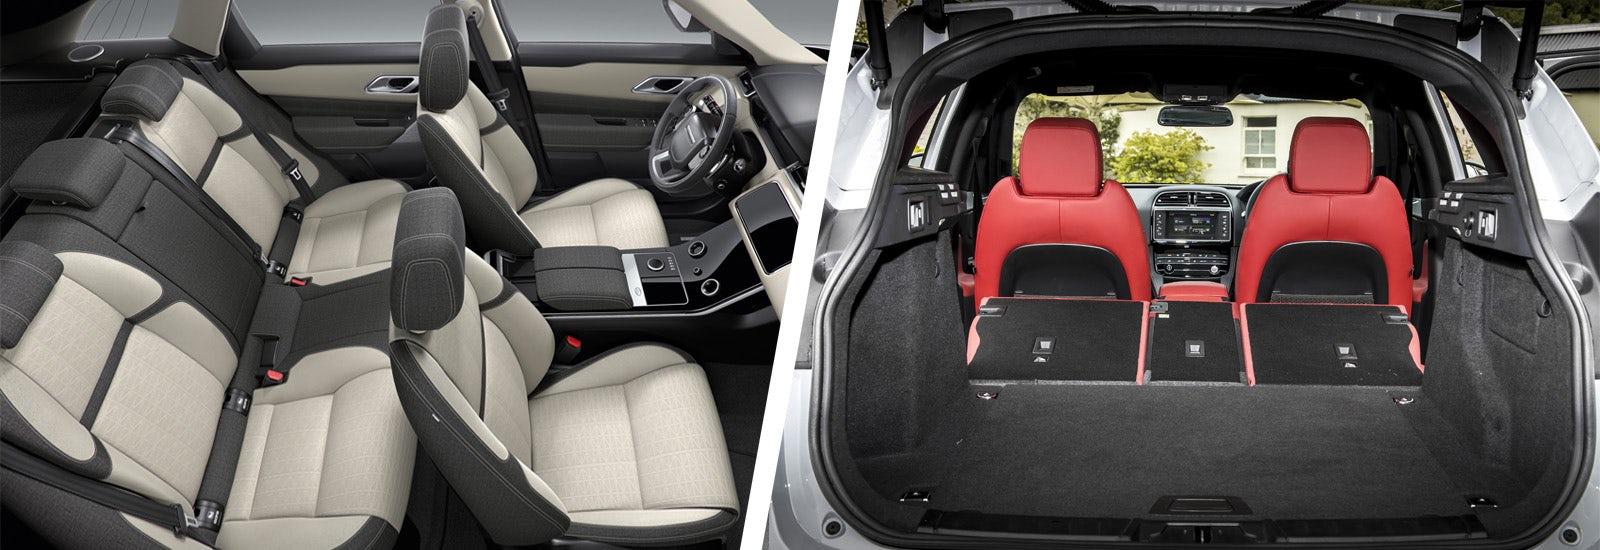 Range Rover Velar Vs Jaguar F-Pace SUV Comparison